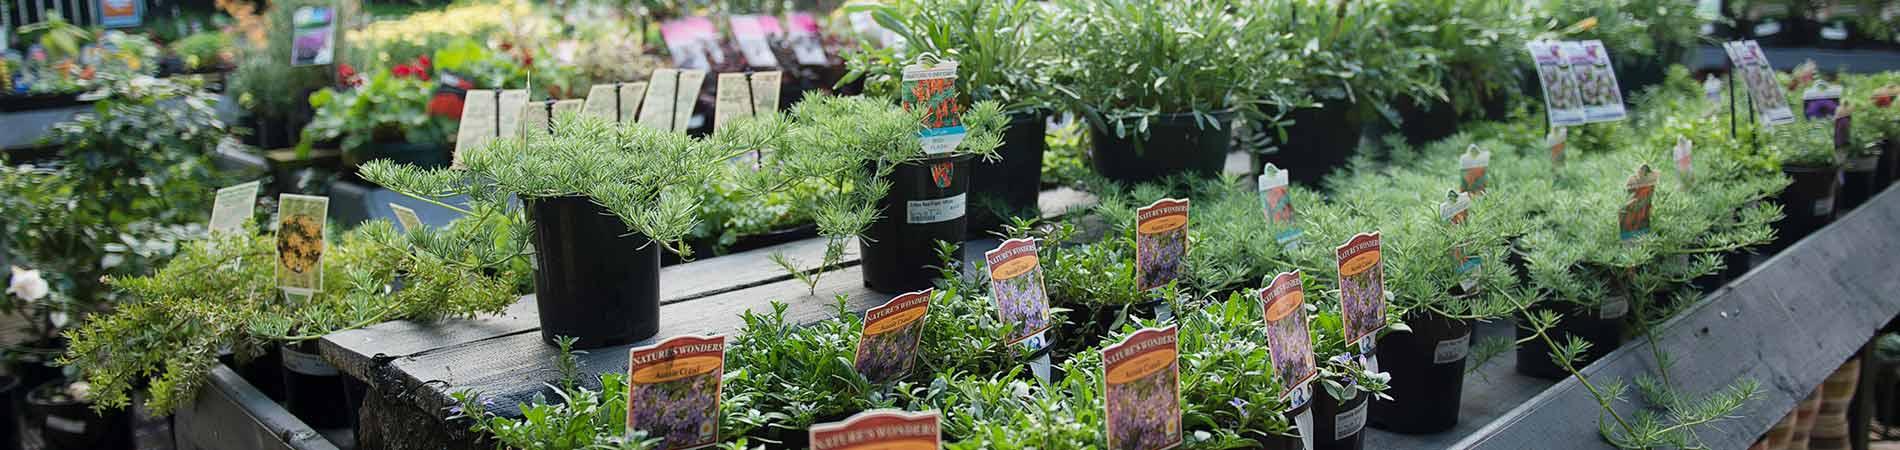 Drysdale Plant Nursery